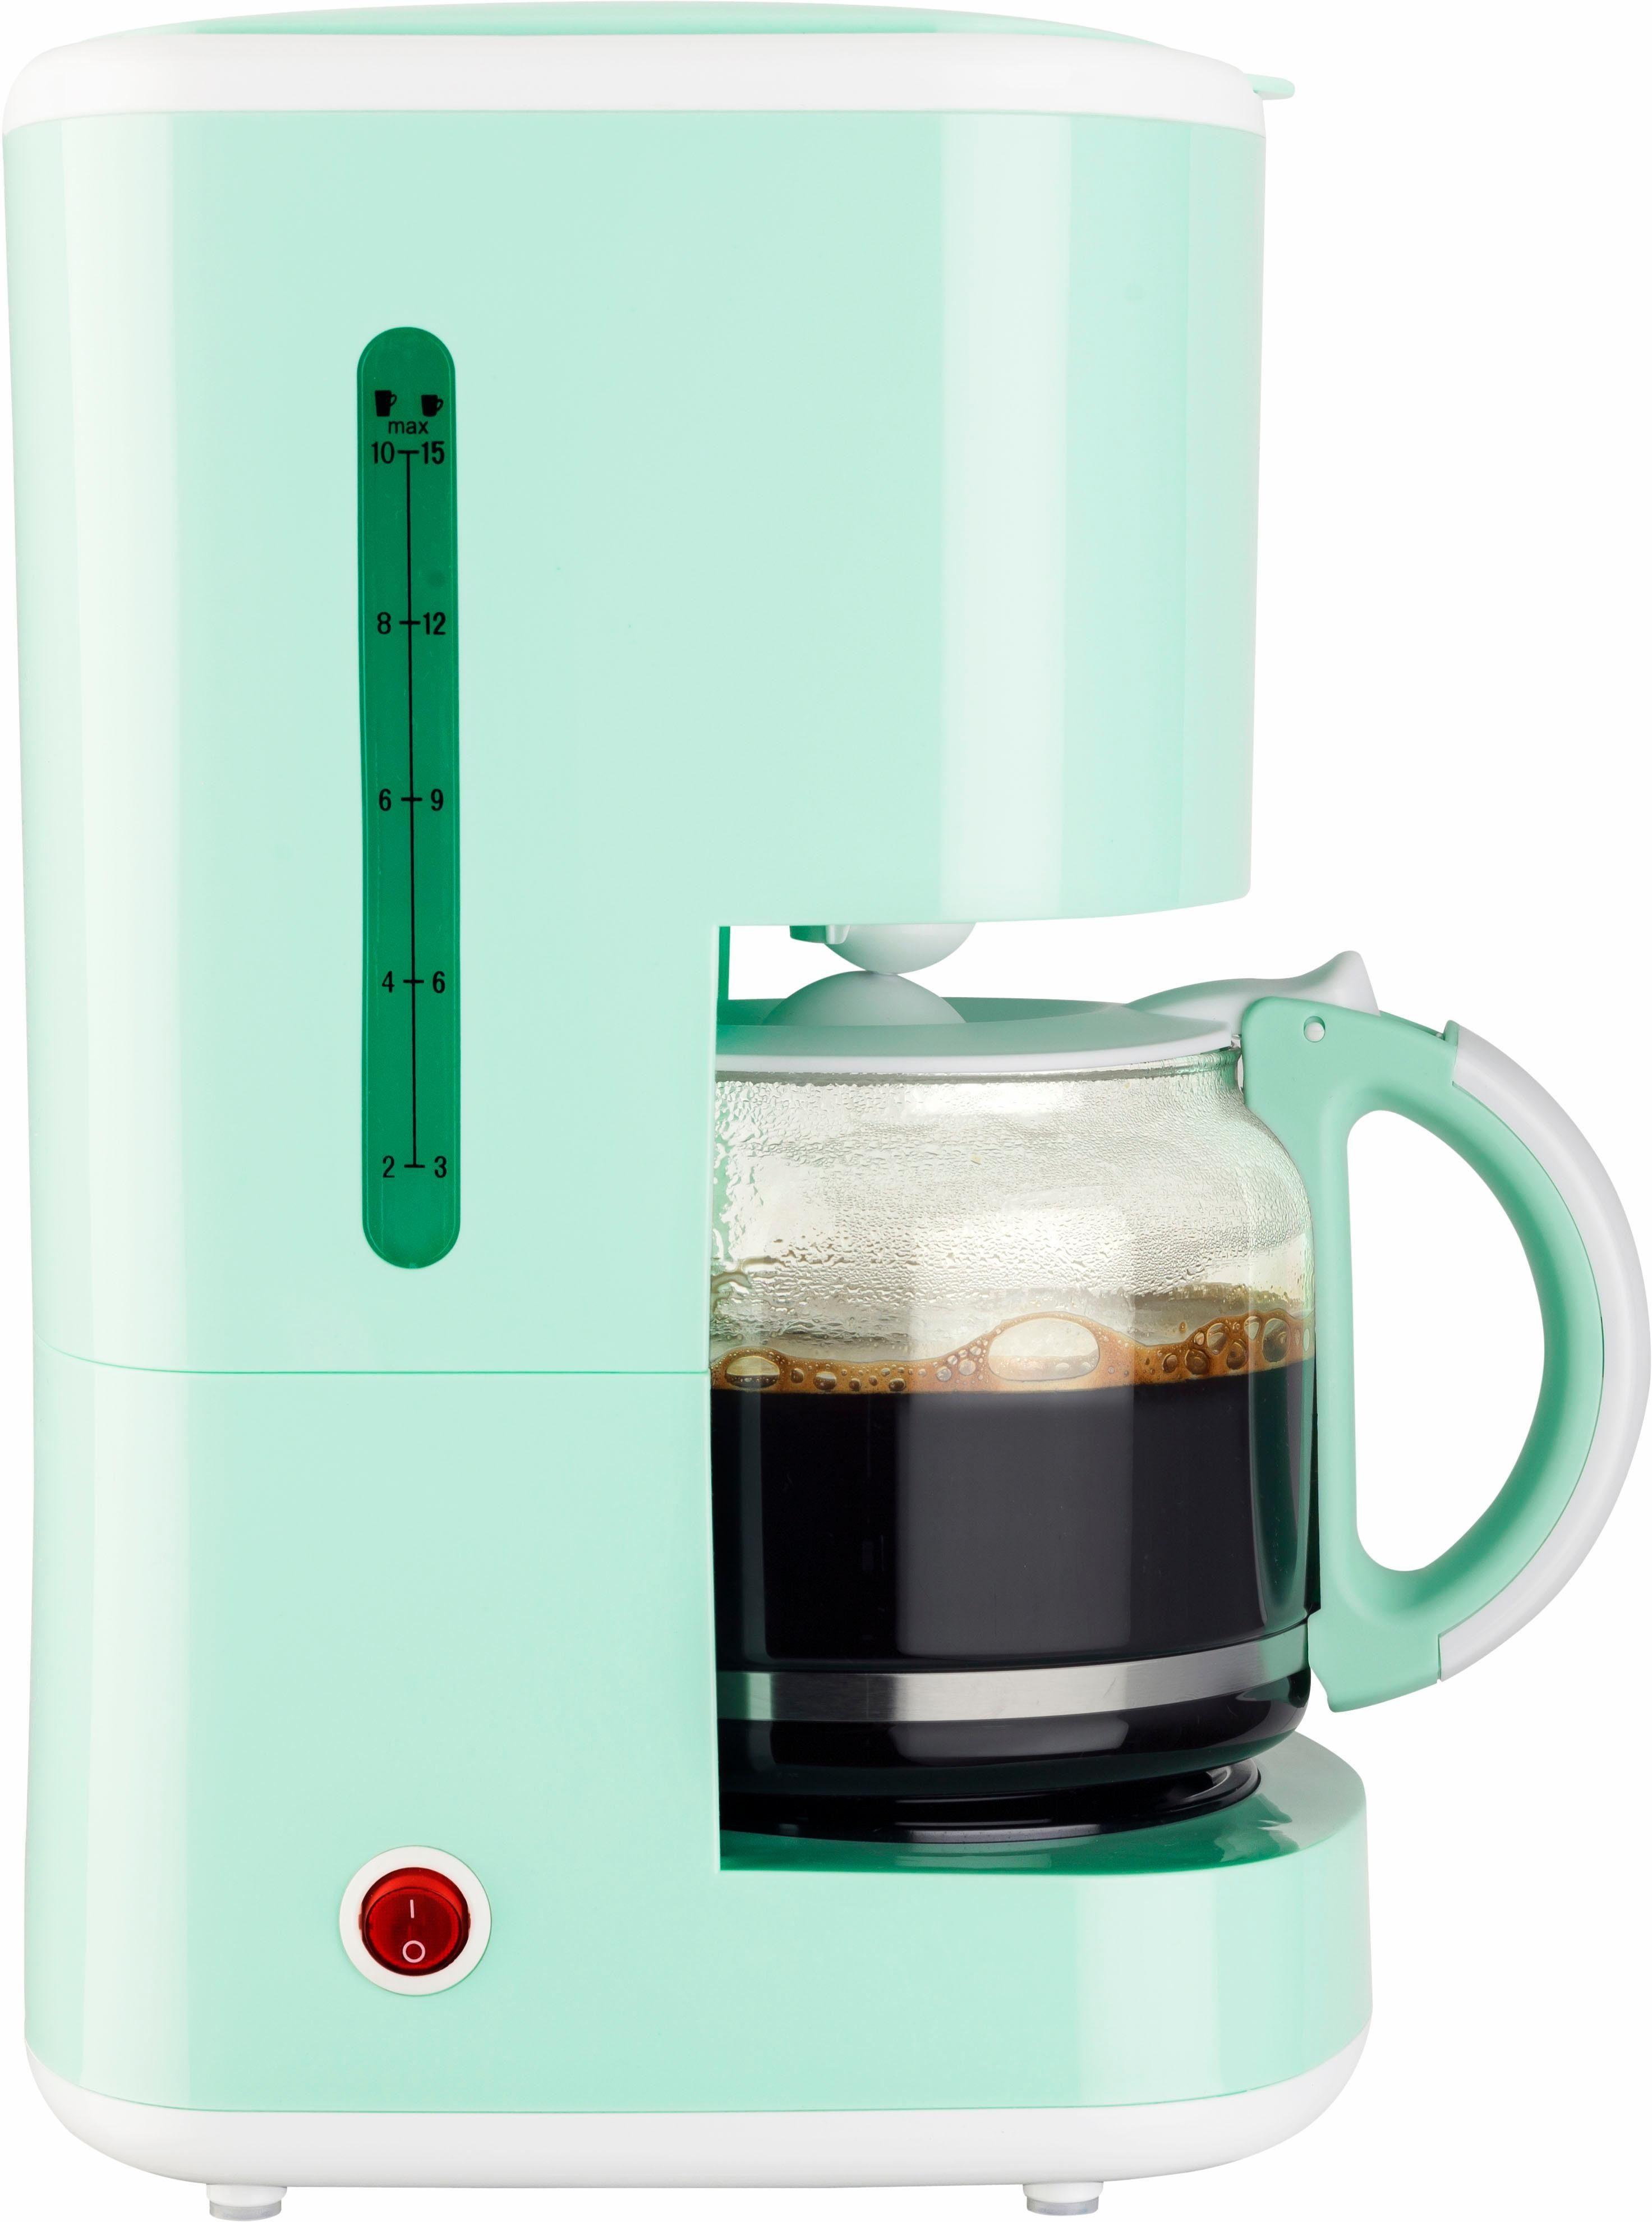 bestron Filterkaffeemaschine ACM300EVM, 1,5l Kaffeekanne, Permanentfilter 1x4